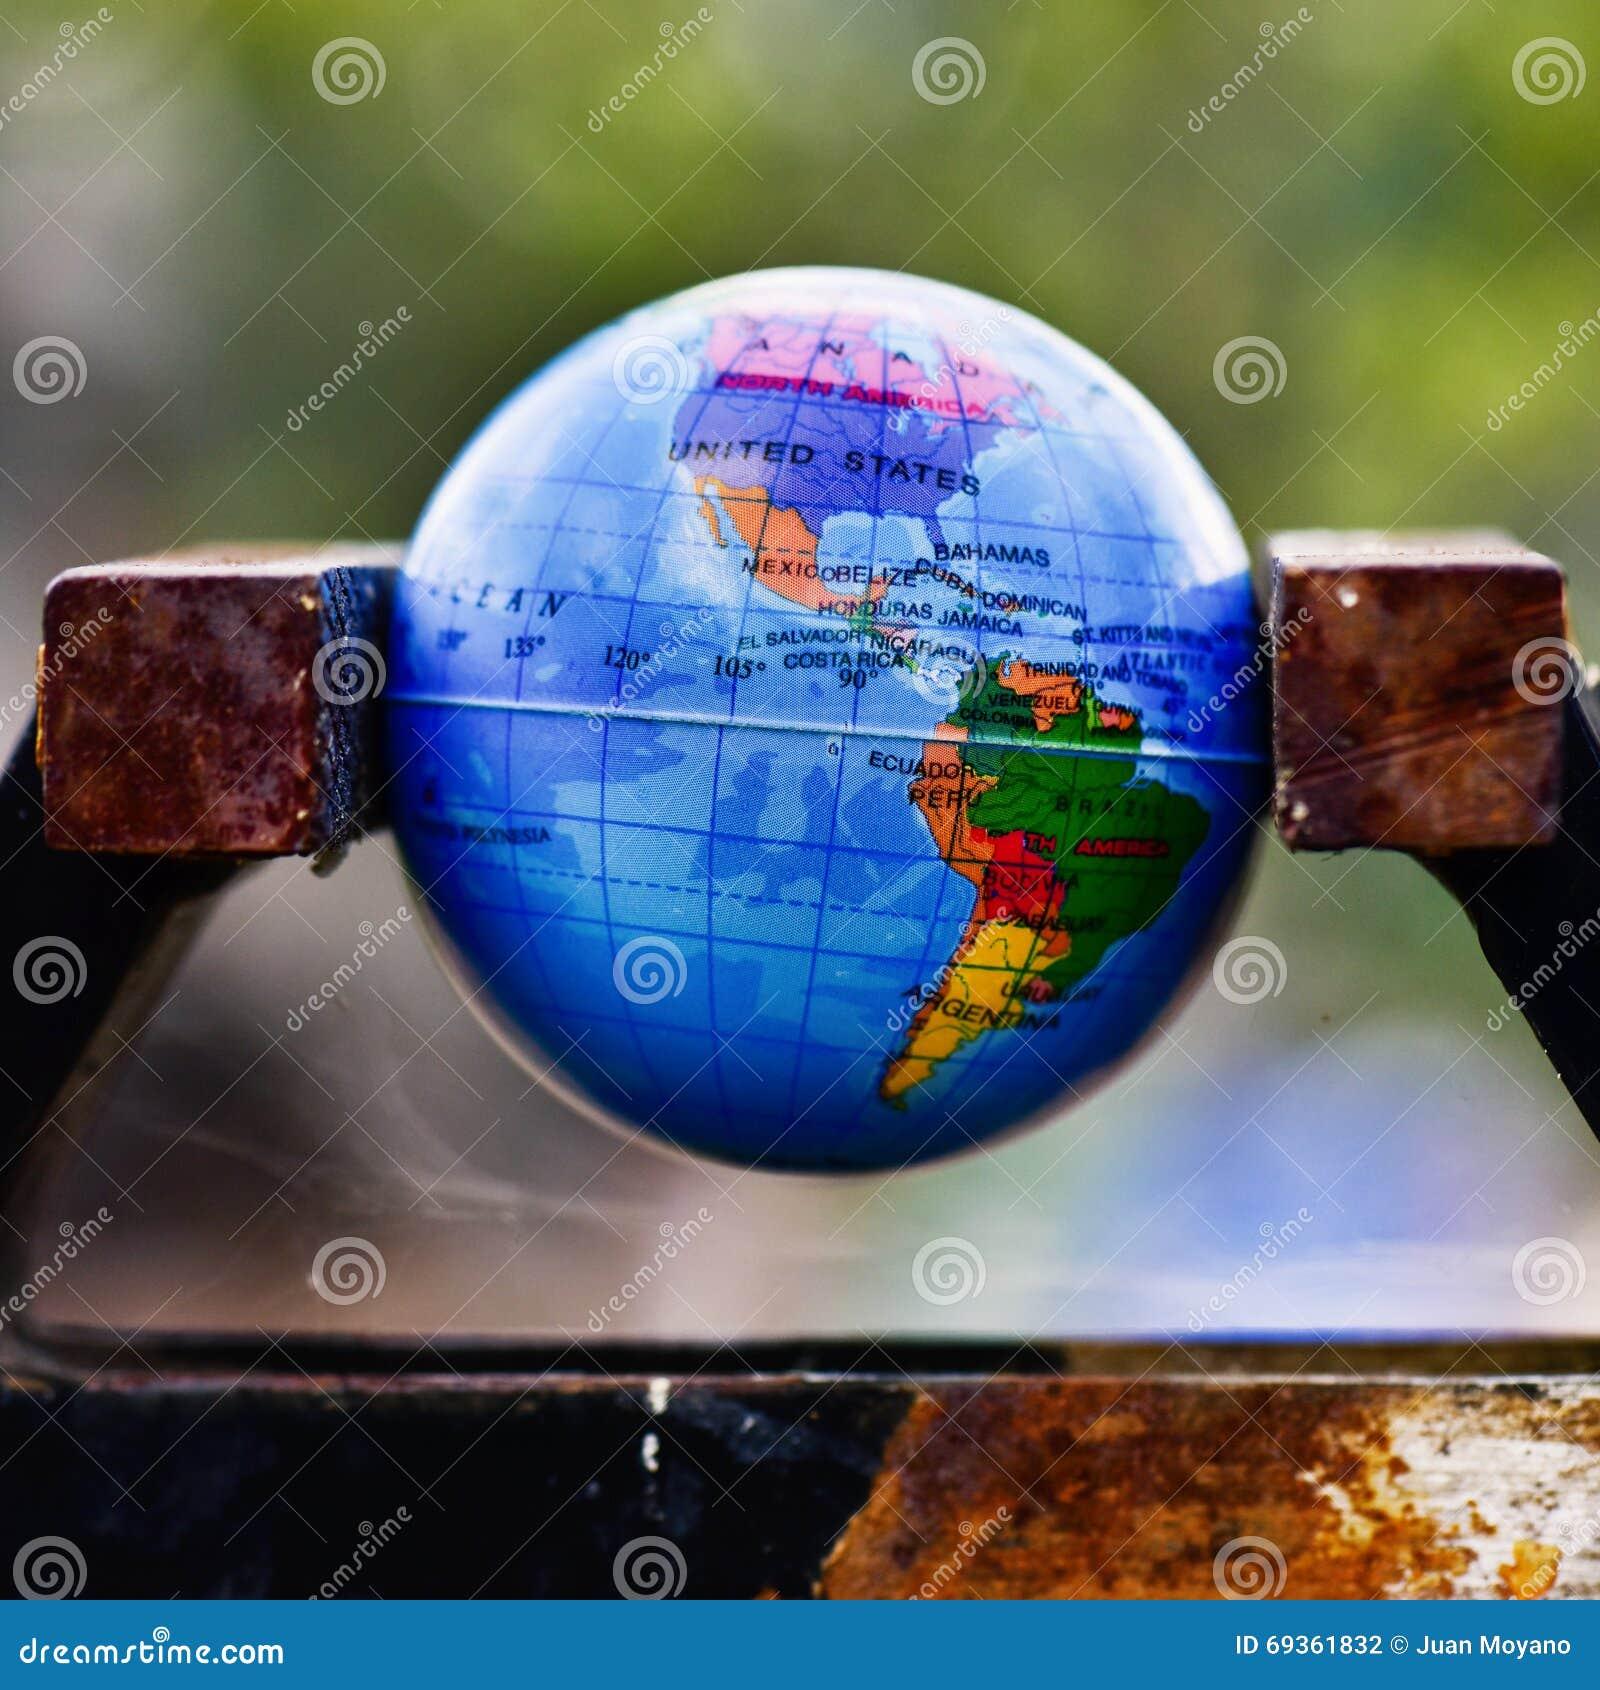 World globe in a vise